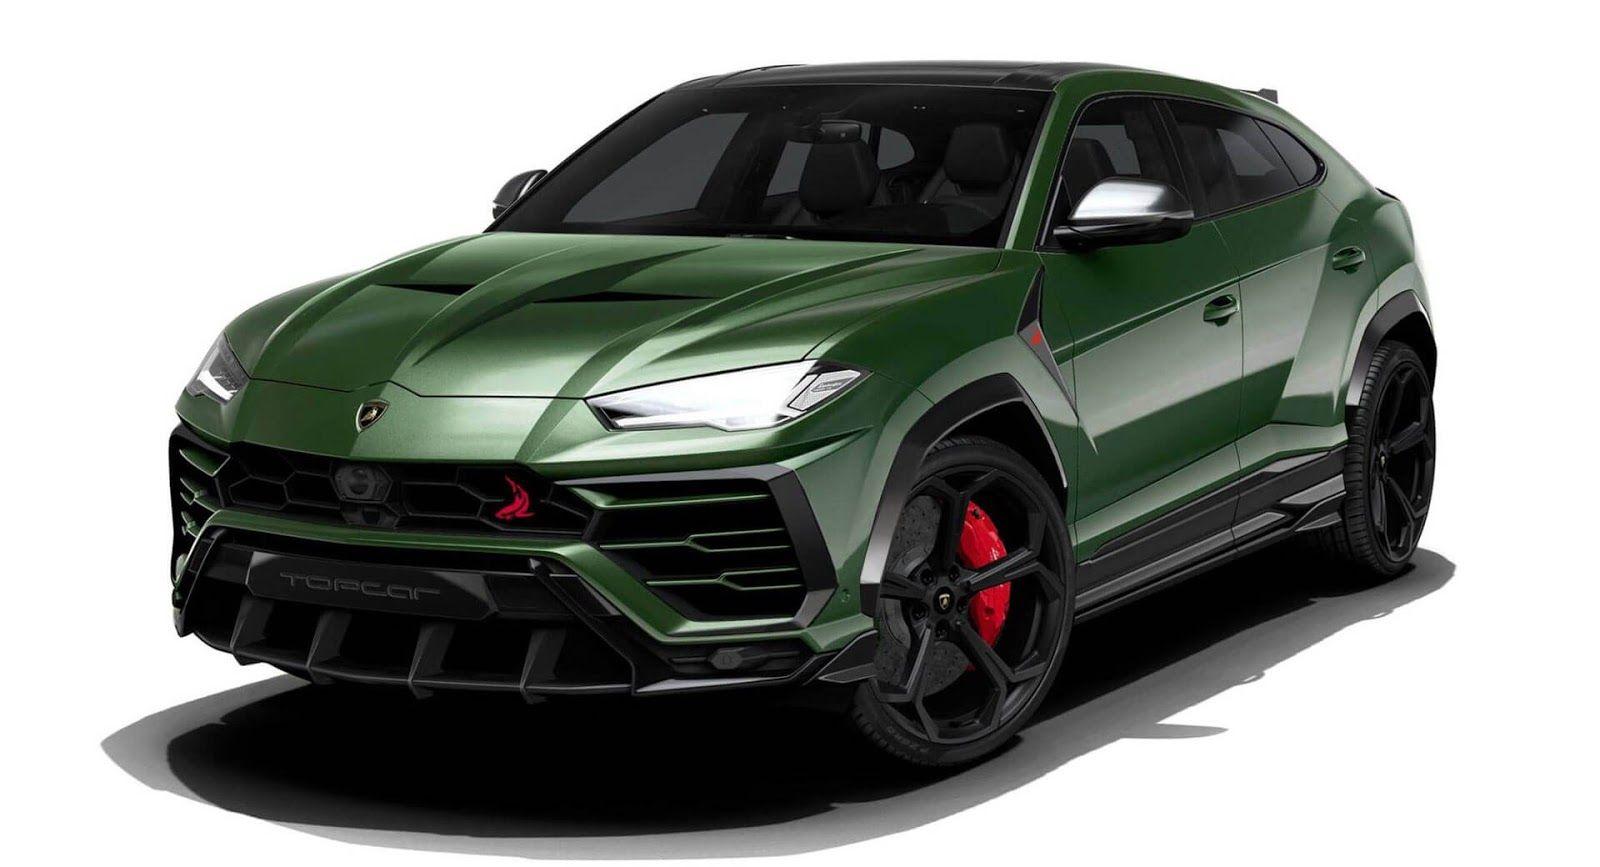 Topcar Planning Aggressive Body Kit For The Lamborghini Urus Lamborghini Car Top Cars